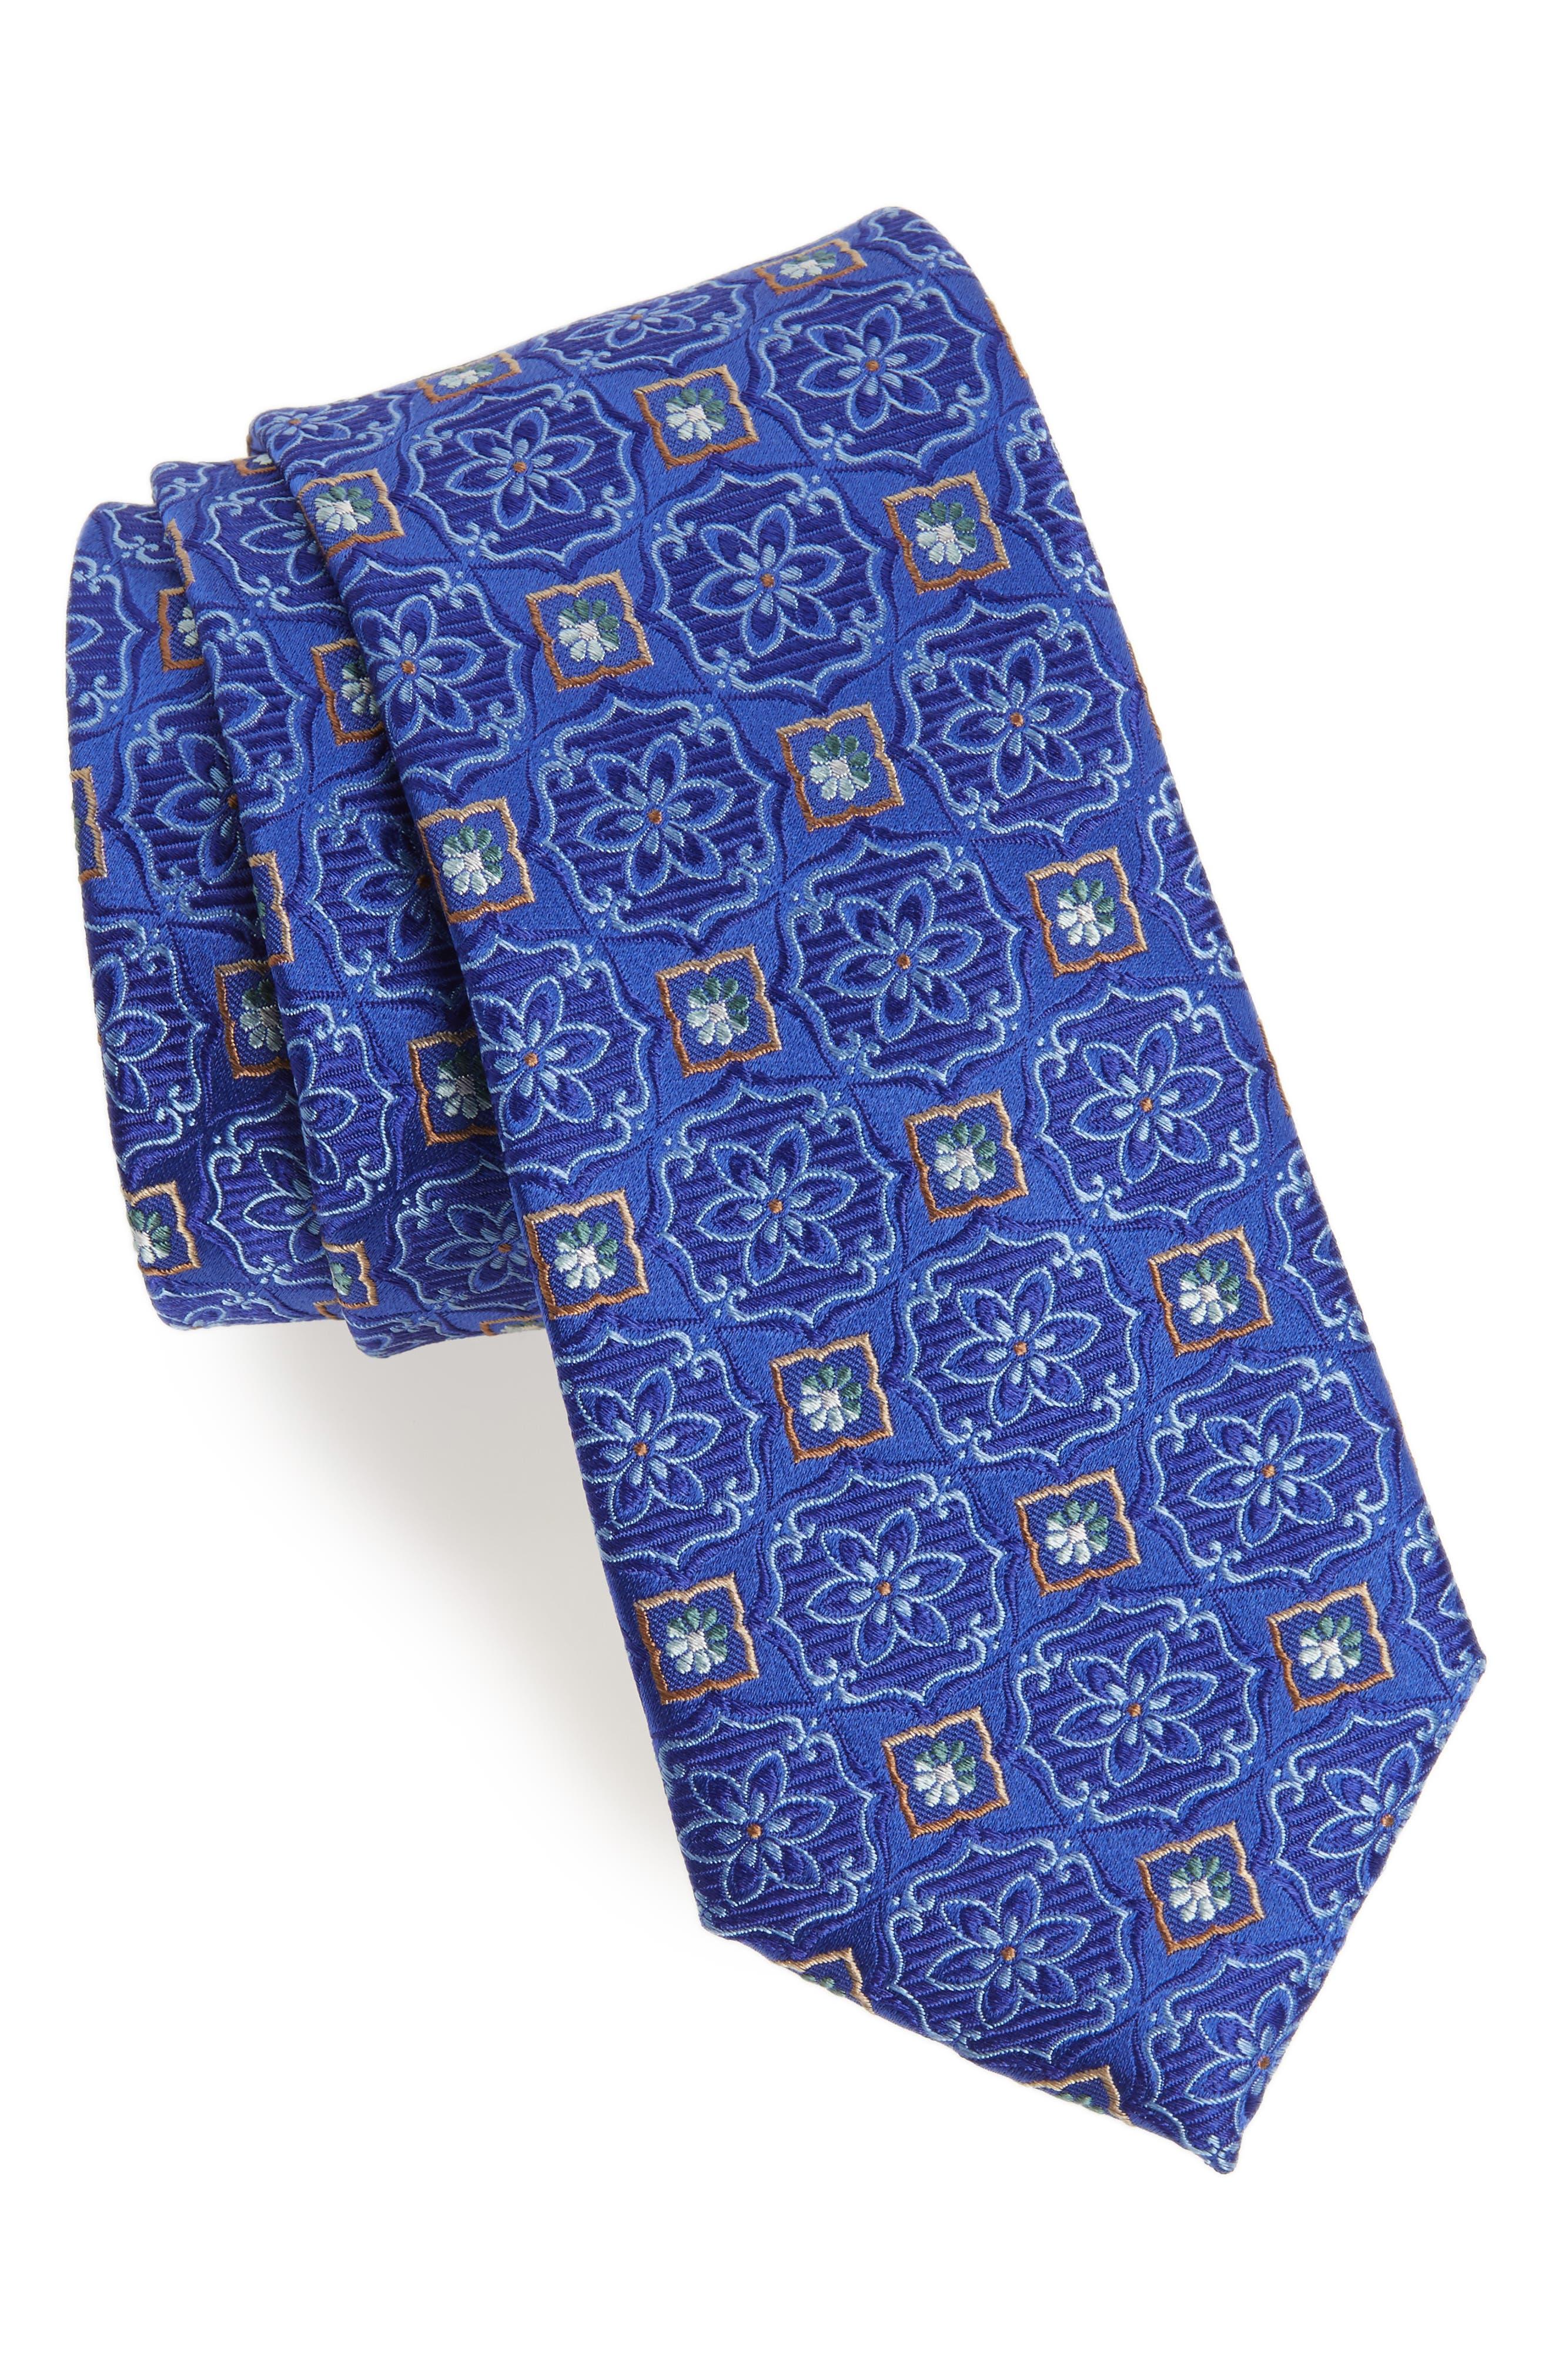 Main Image - Nordstrom Men's Shop Floral Medallion Silk Tie